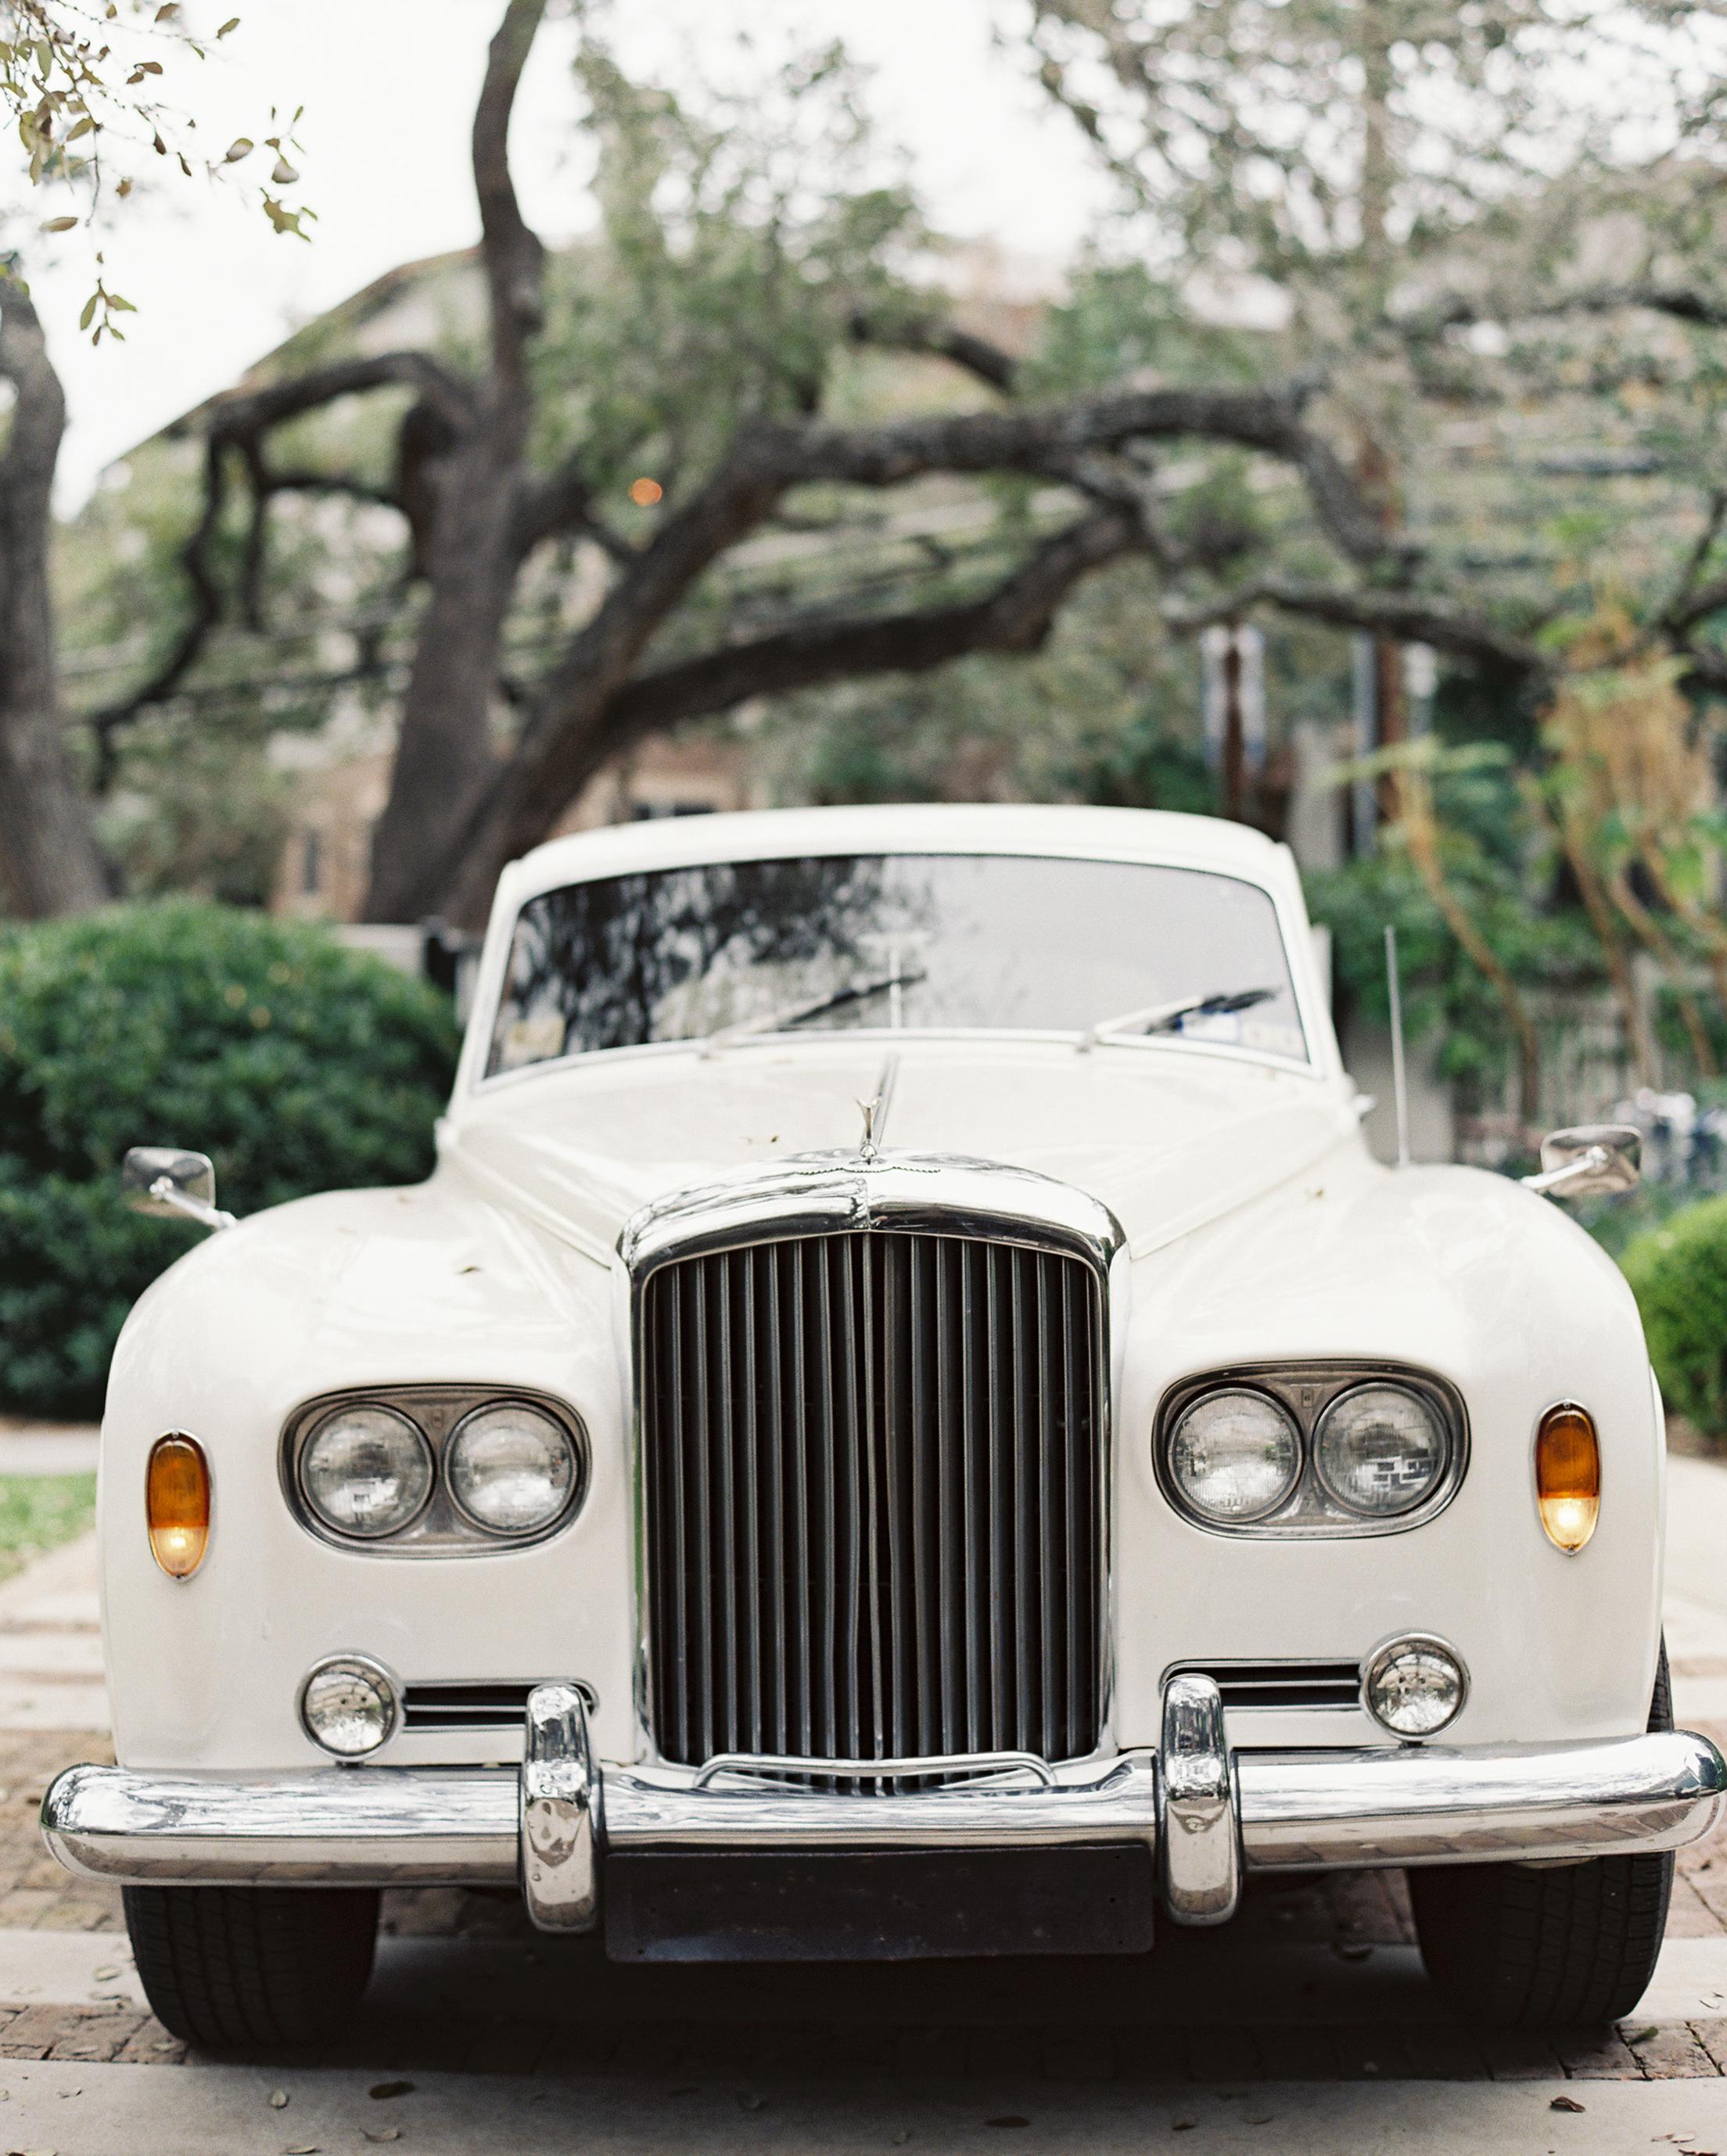 stacey-adam-wedding-car-0002-s112112-0815.jpg